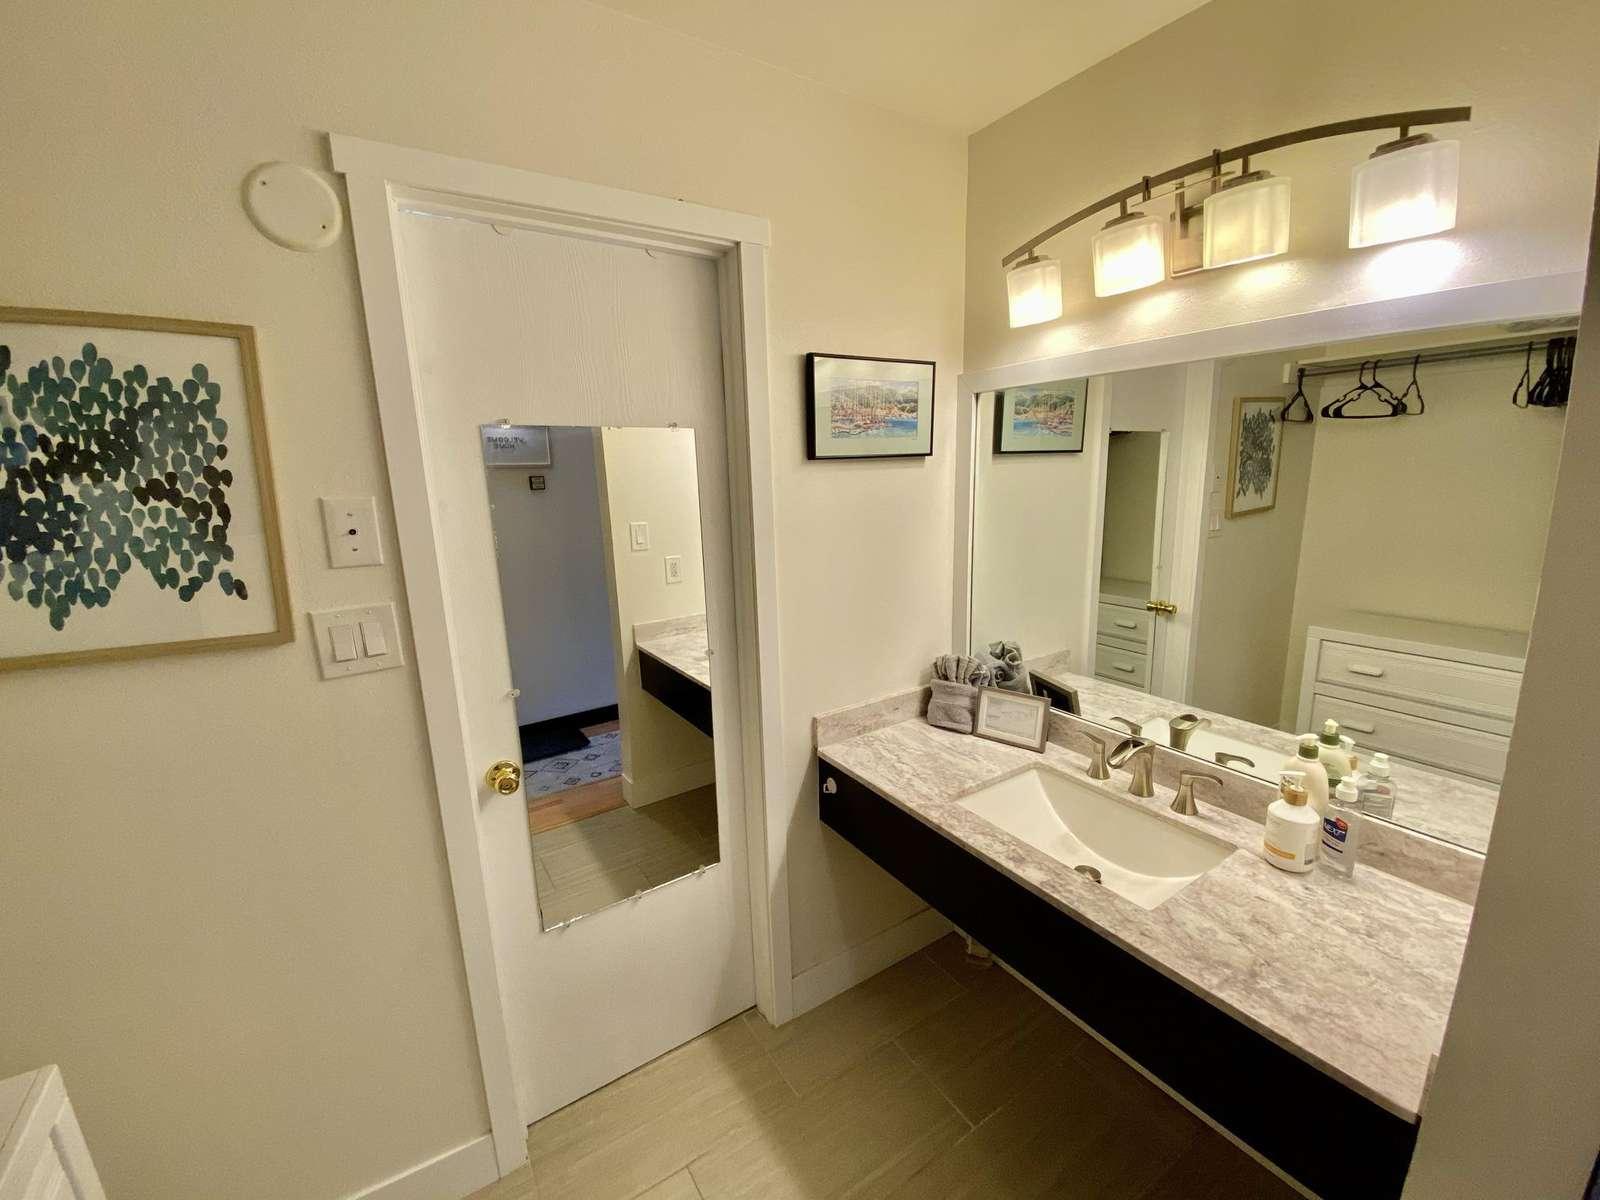 Private bathroom beyond prep room